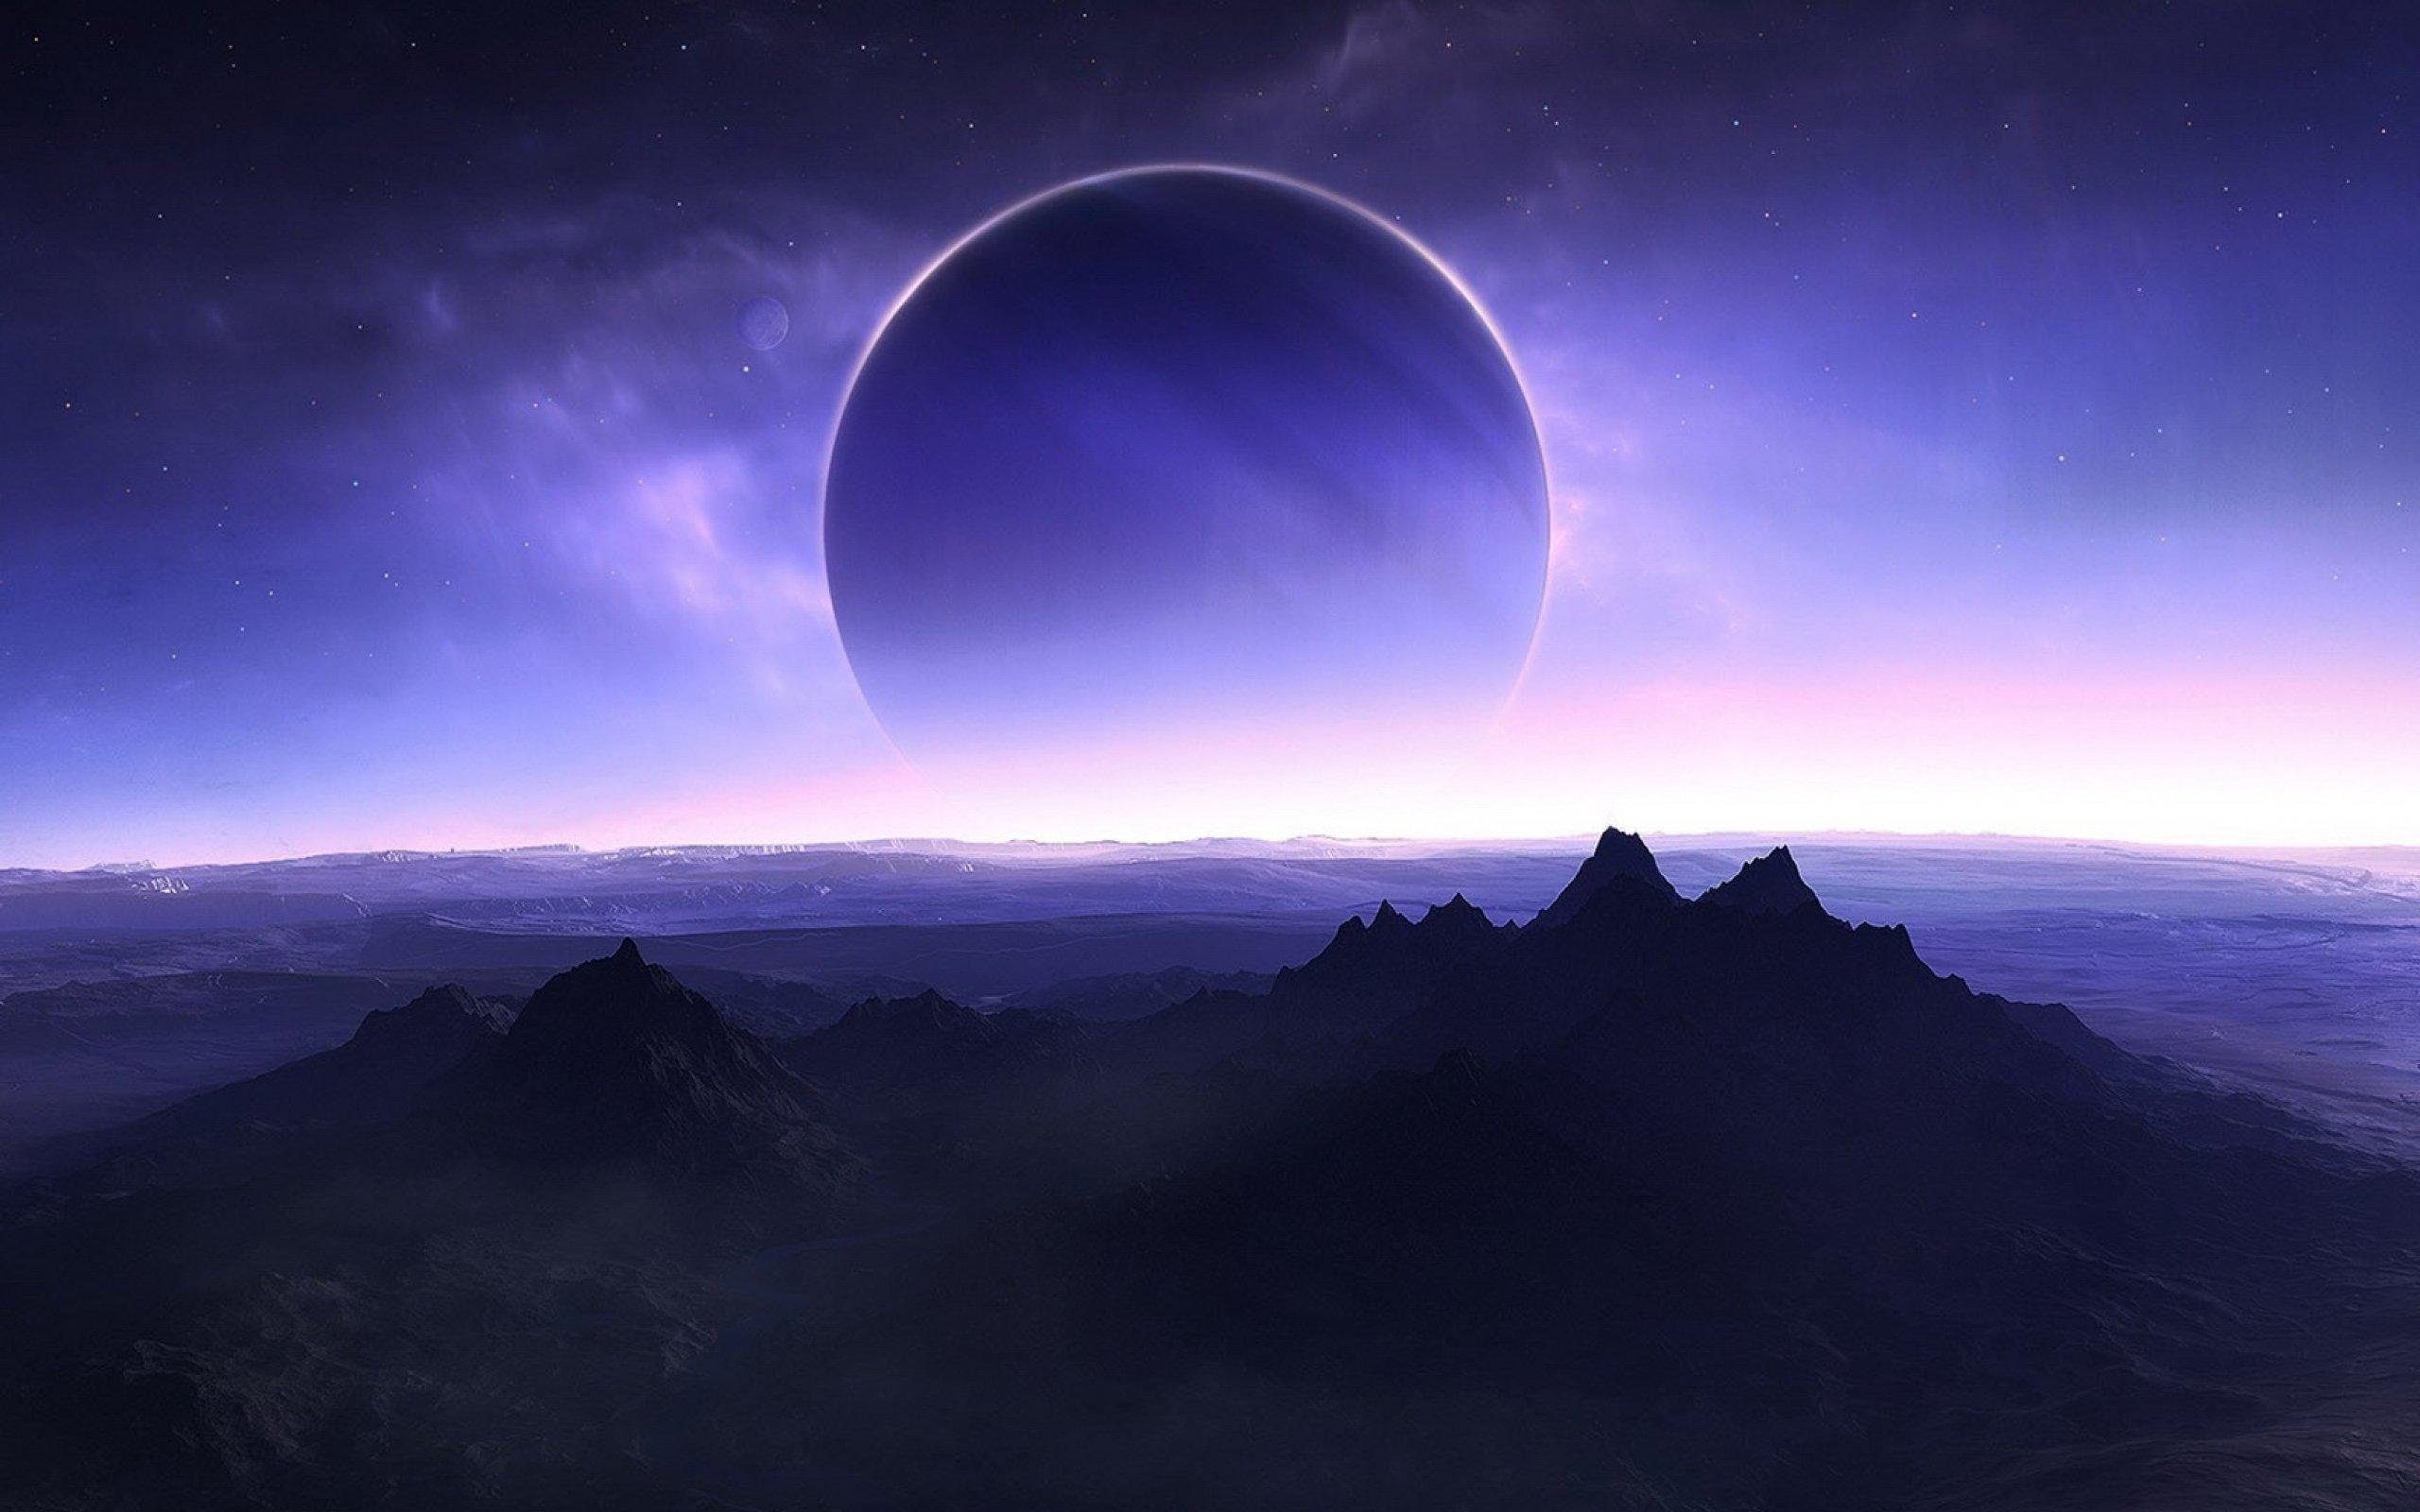 Planetscape sci-fi planet landscape space art artwork wallpaper | 2560x1600 | 660458 | WallpaperUP